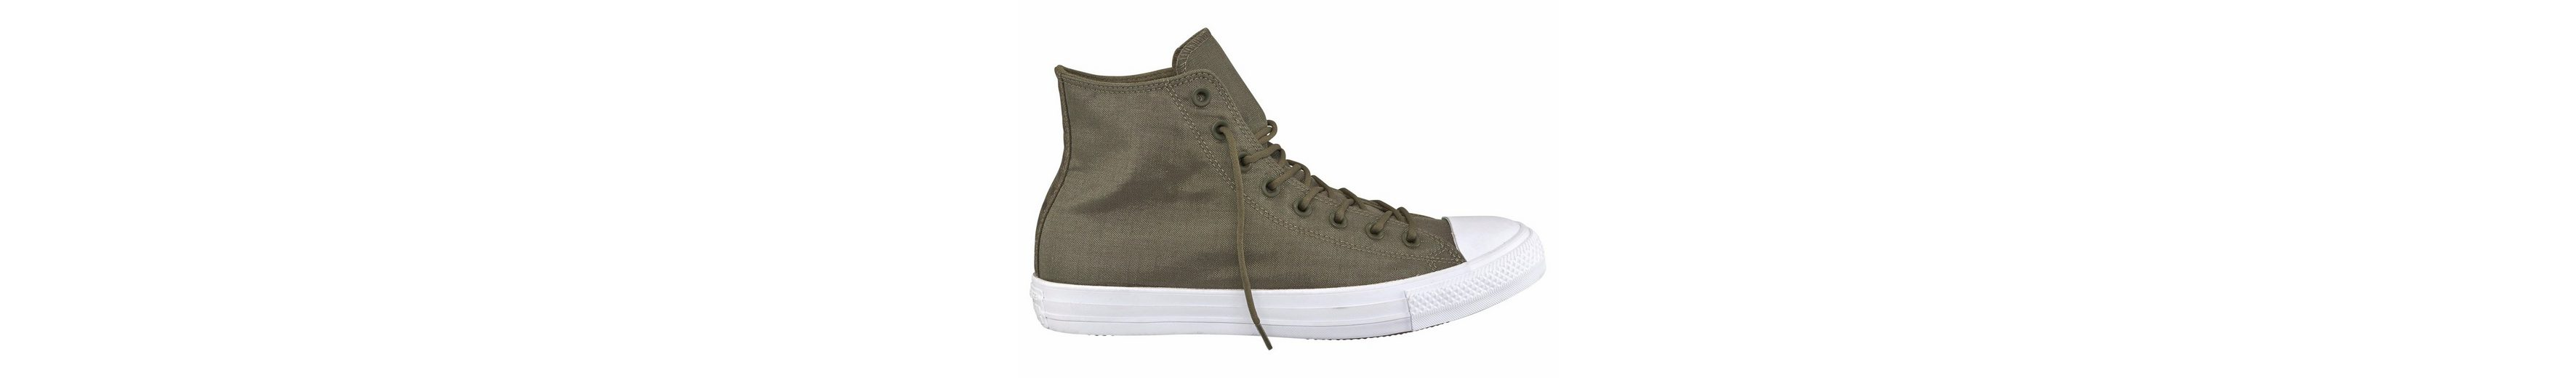 Converse Chuck Taylor All Star Me Sneaker Wie Viel 3zOSAS0